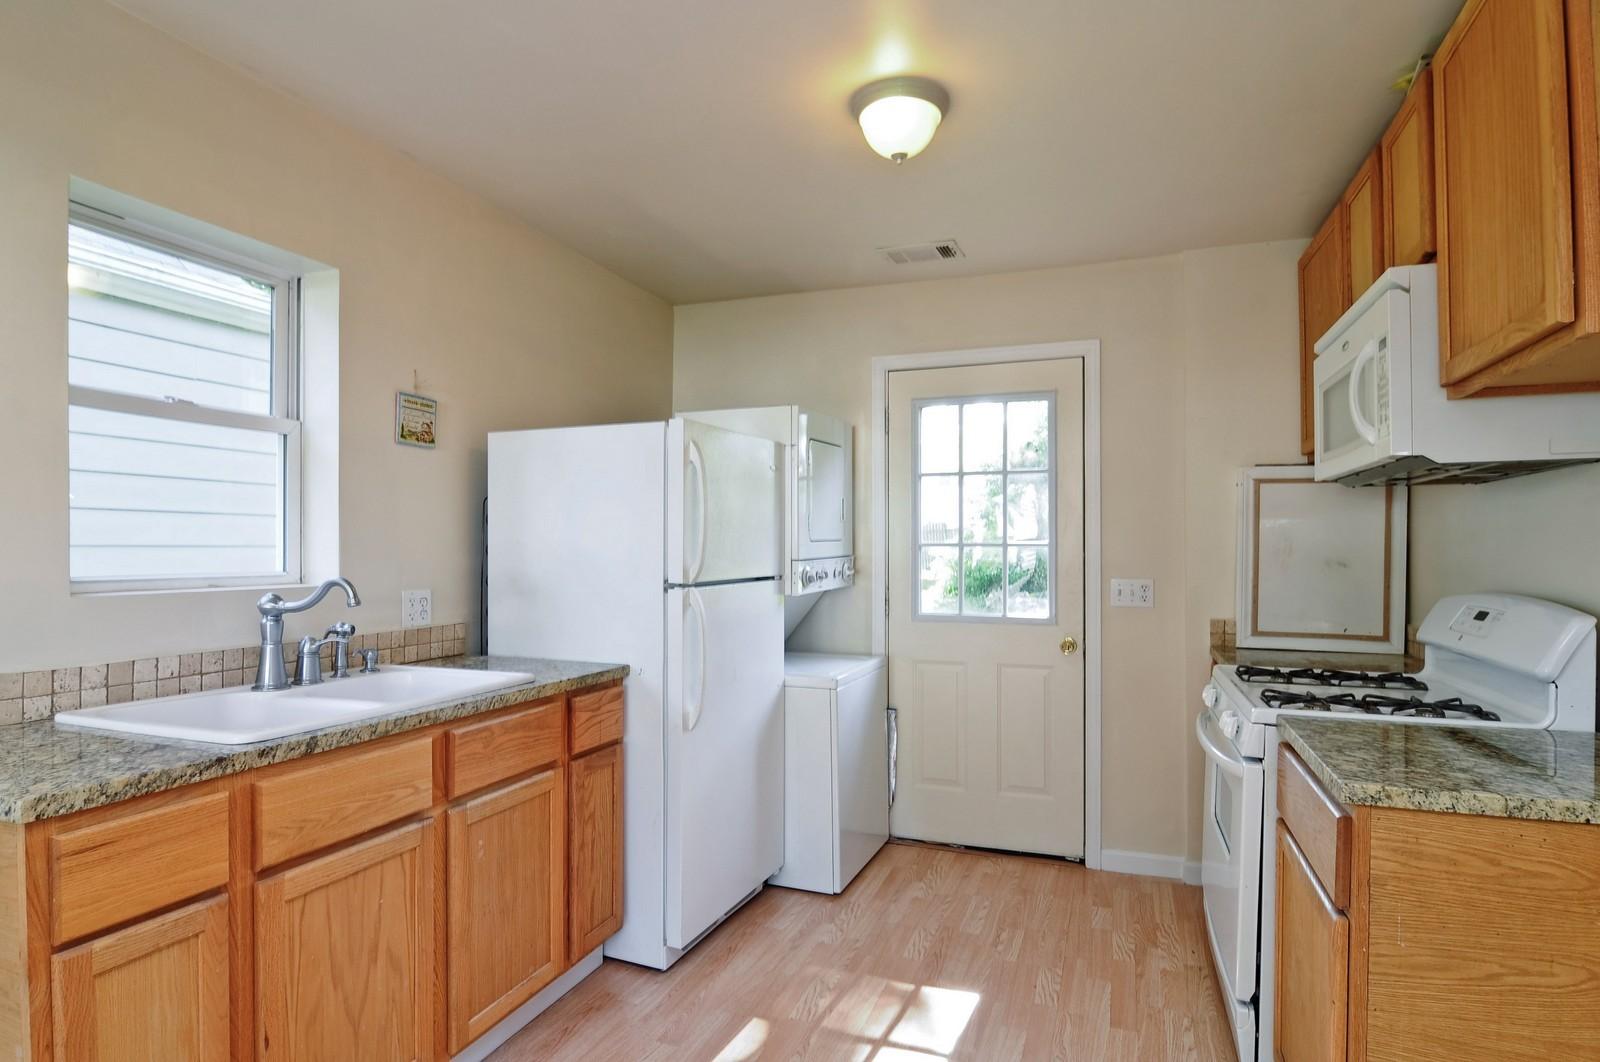 Real Estate Photography - 321 N Bellevue, Round Lake Park, IL, 60073 - Kitchen